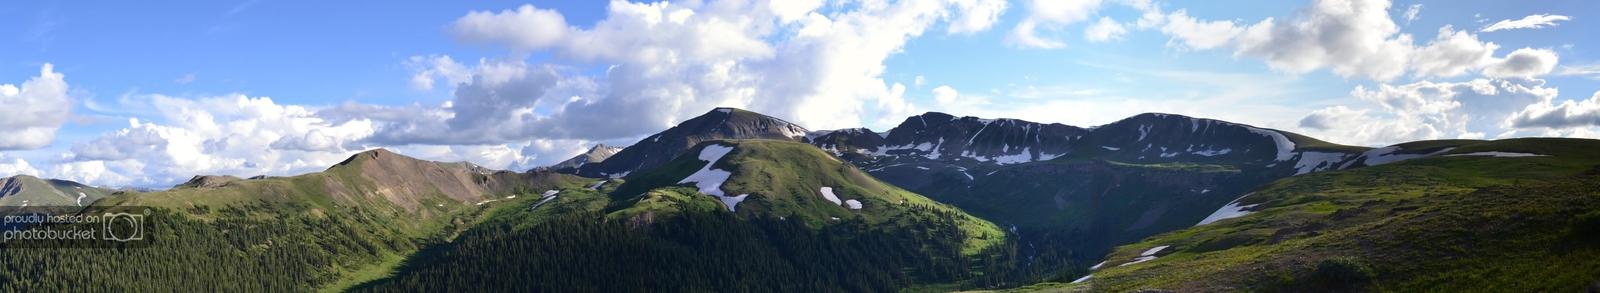 ColoradoTrip2011851_Stitch.jpg